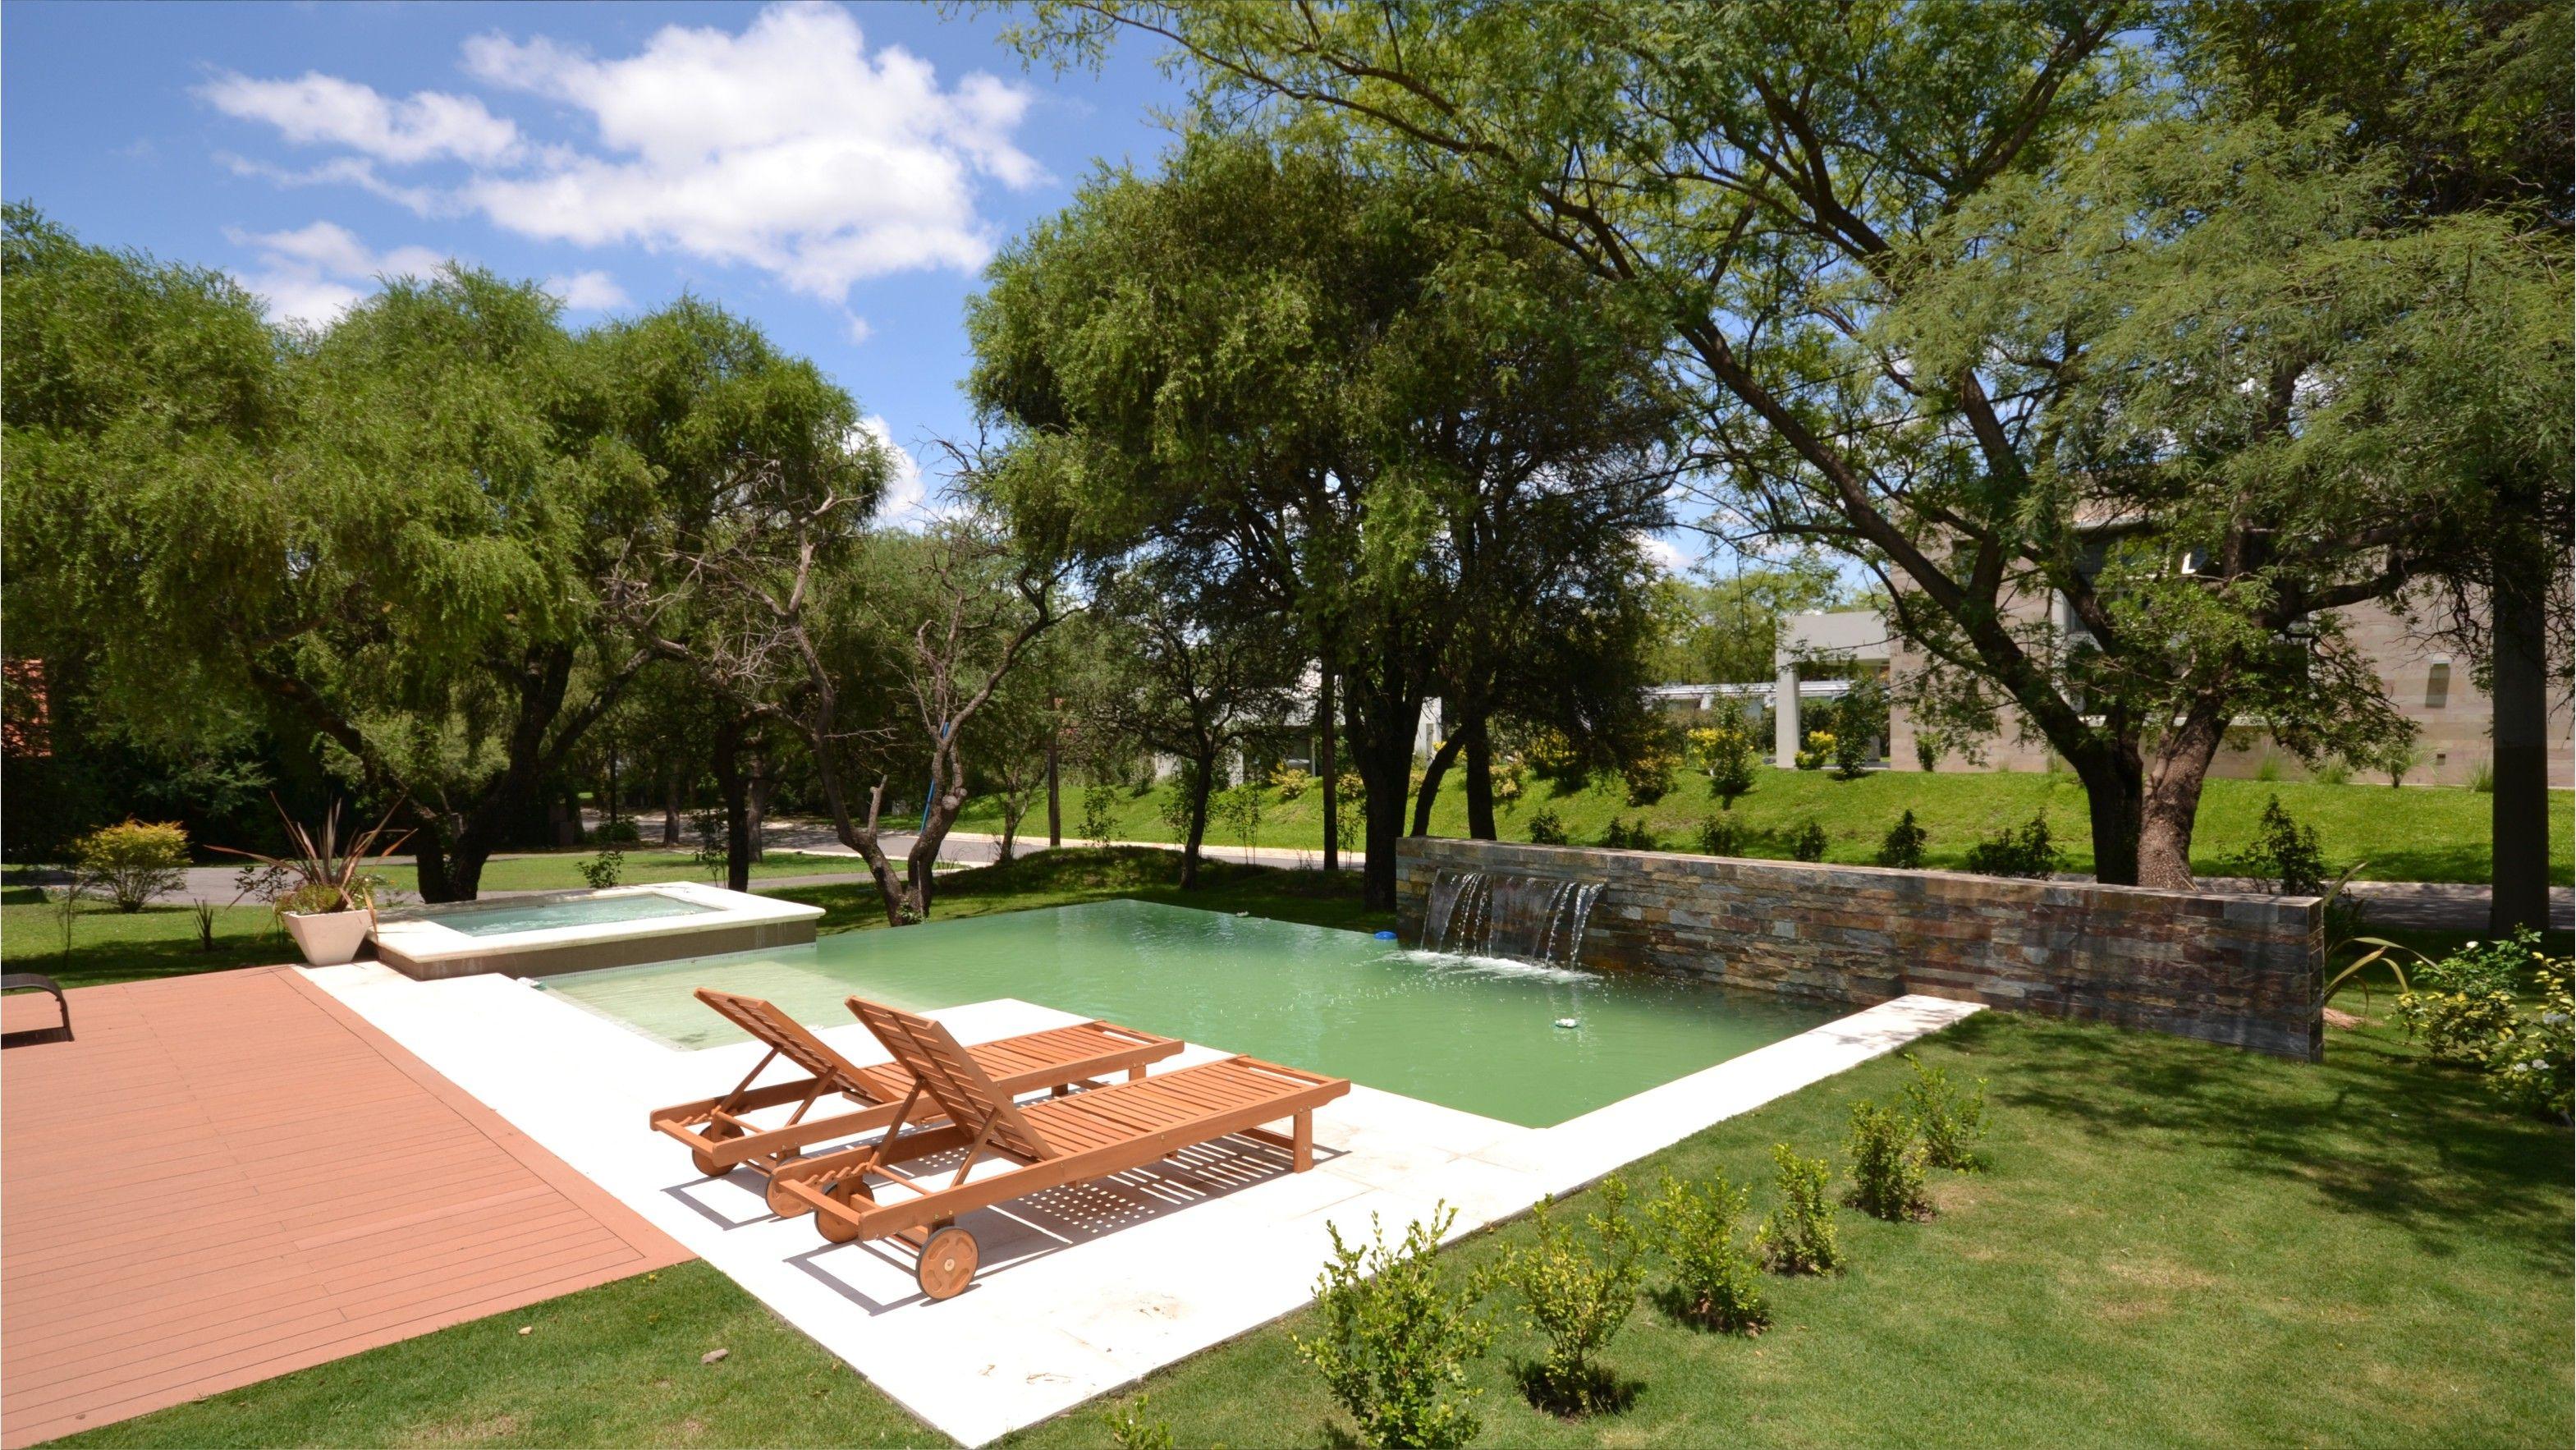 piscina - desborde infinito - hidro- lengua de agua - muro